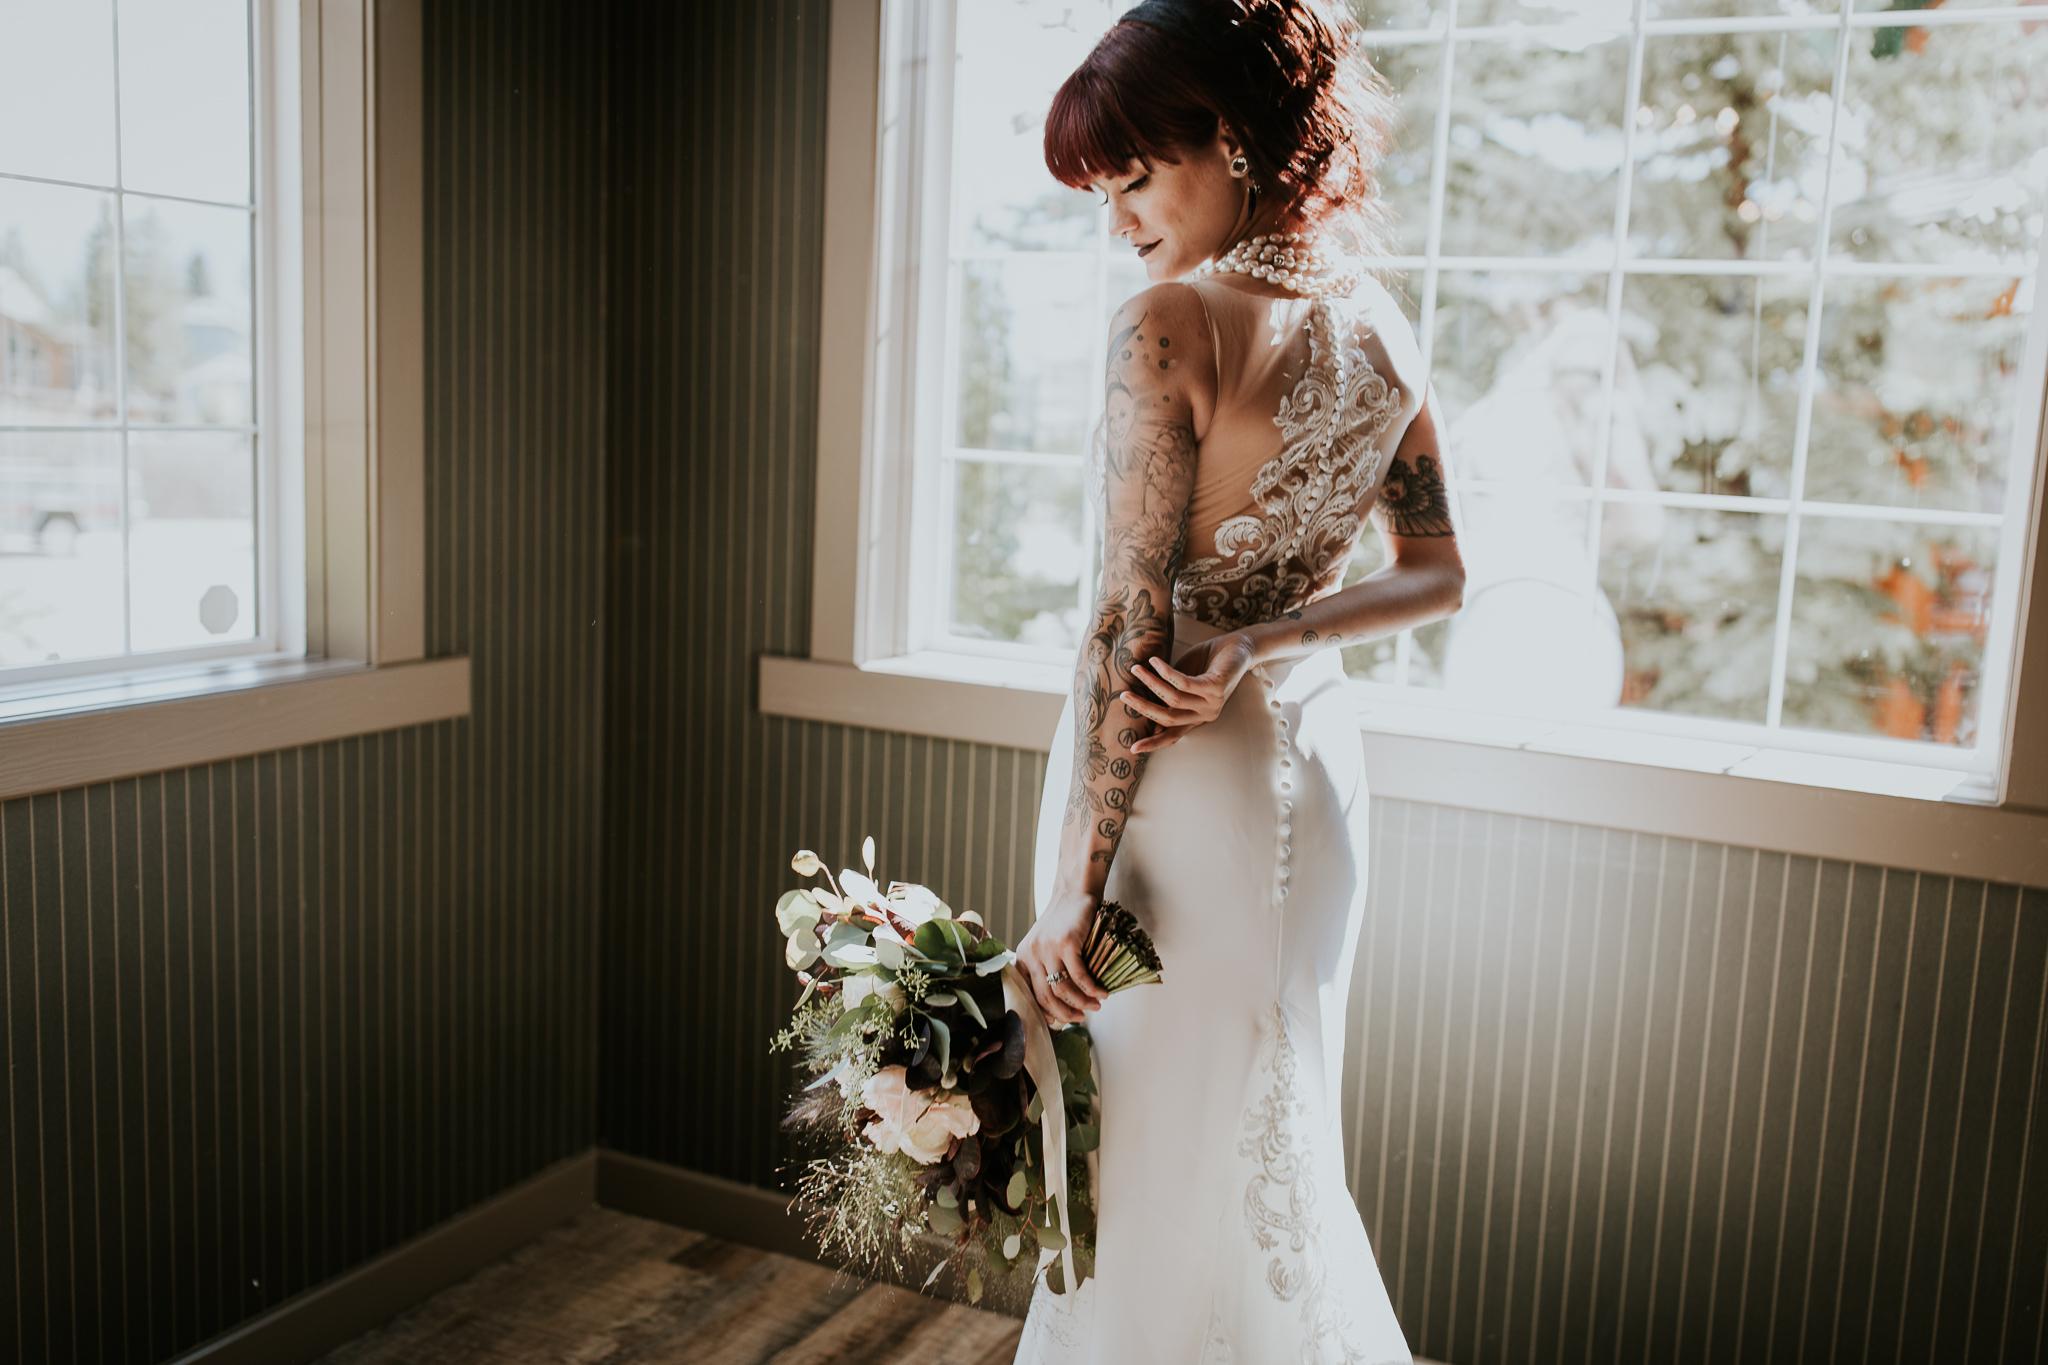 20170915-canmore-moody-wedding-photographer-creekside-creeksidestyledshoot-time&fate-5560.jpg